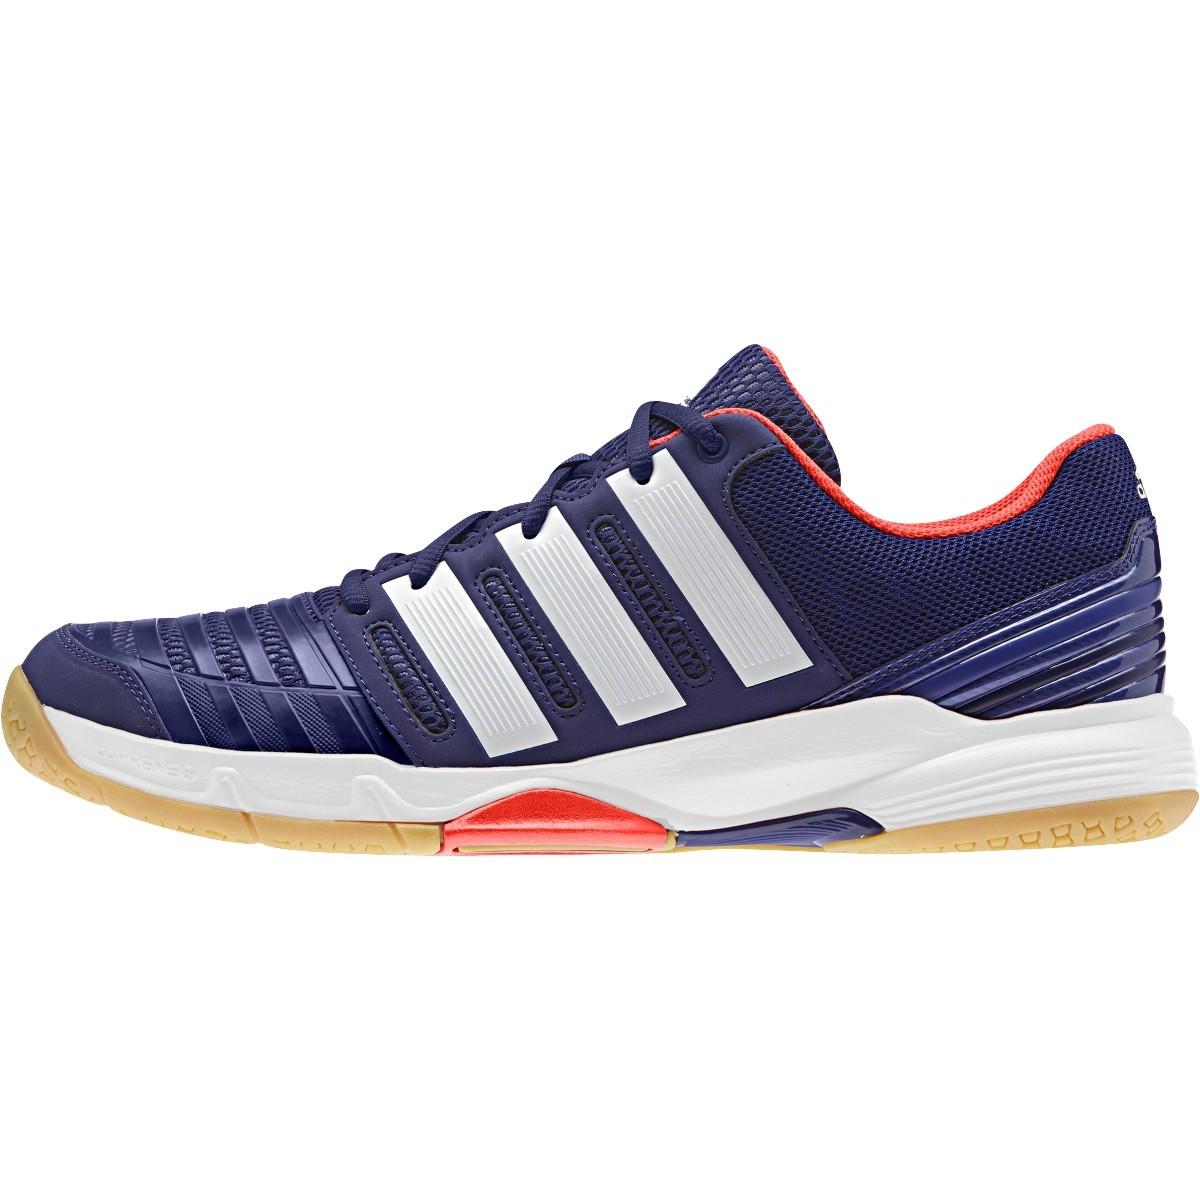 b385719dc32 Pánská sálová obuv adidas court stabil 11   D-Sport